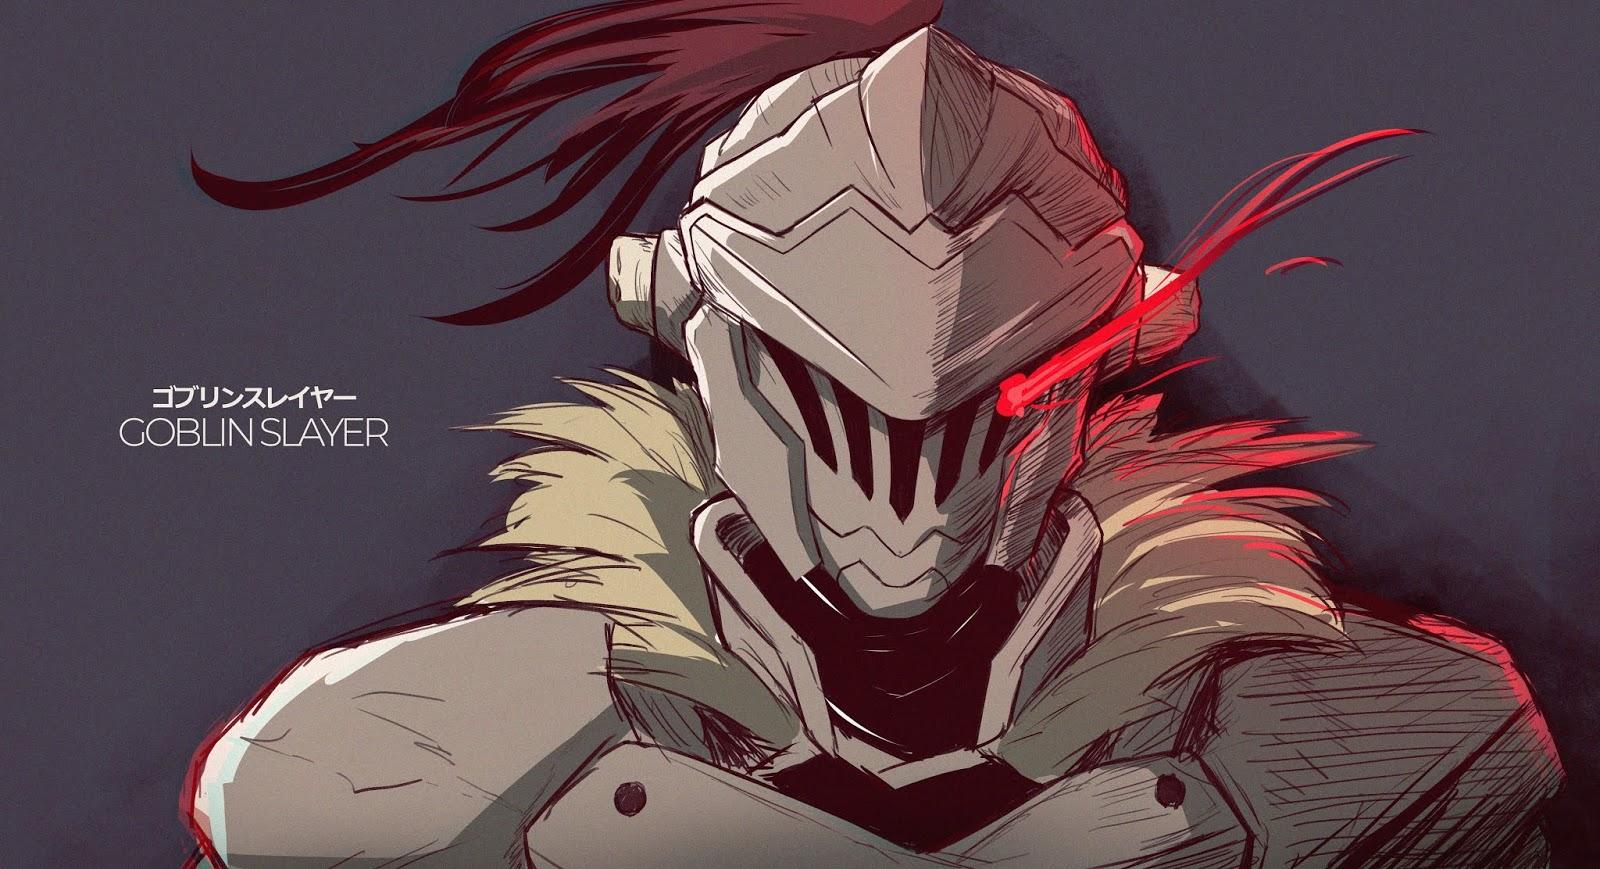 Goblin Slayer - Batch Subtitle Indonesia